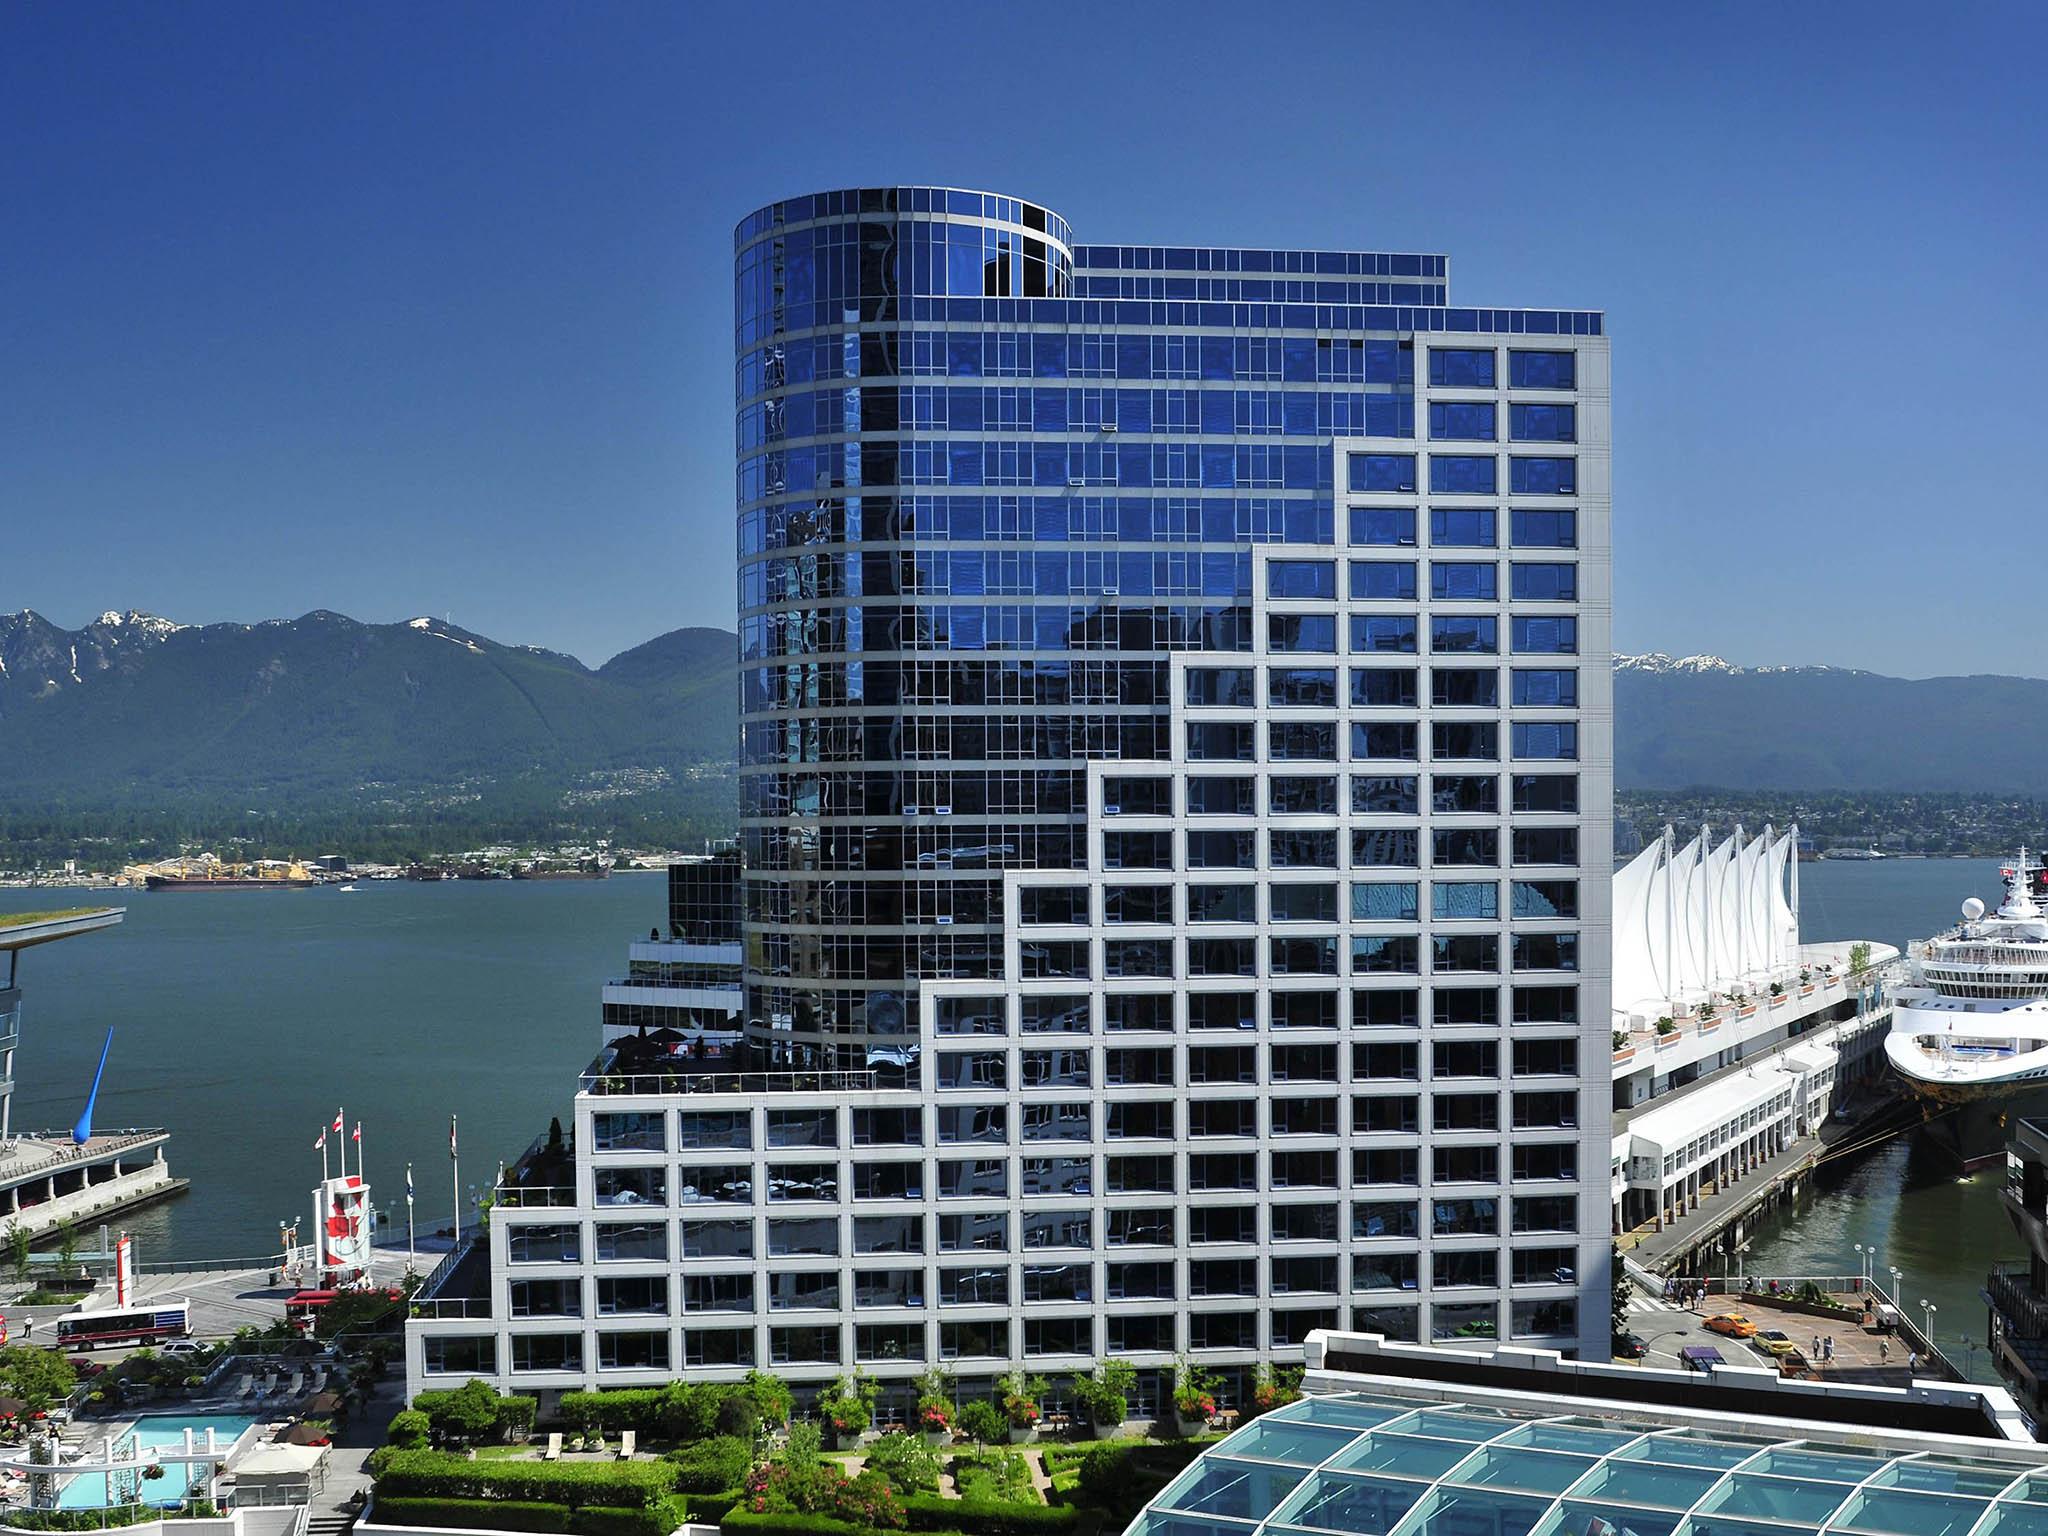 Hotel – Fairmont Waterfront